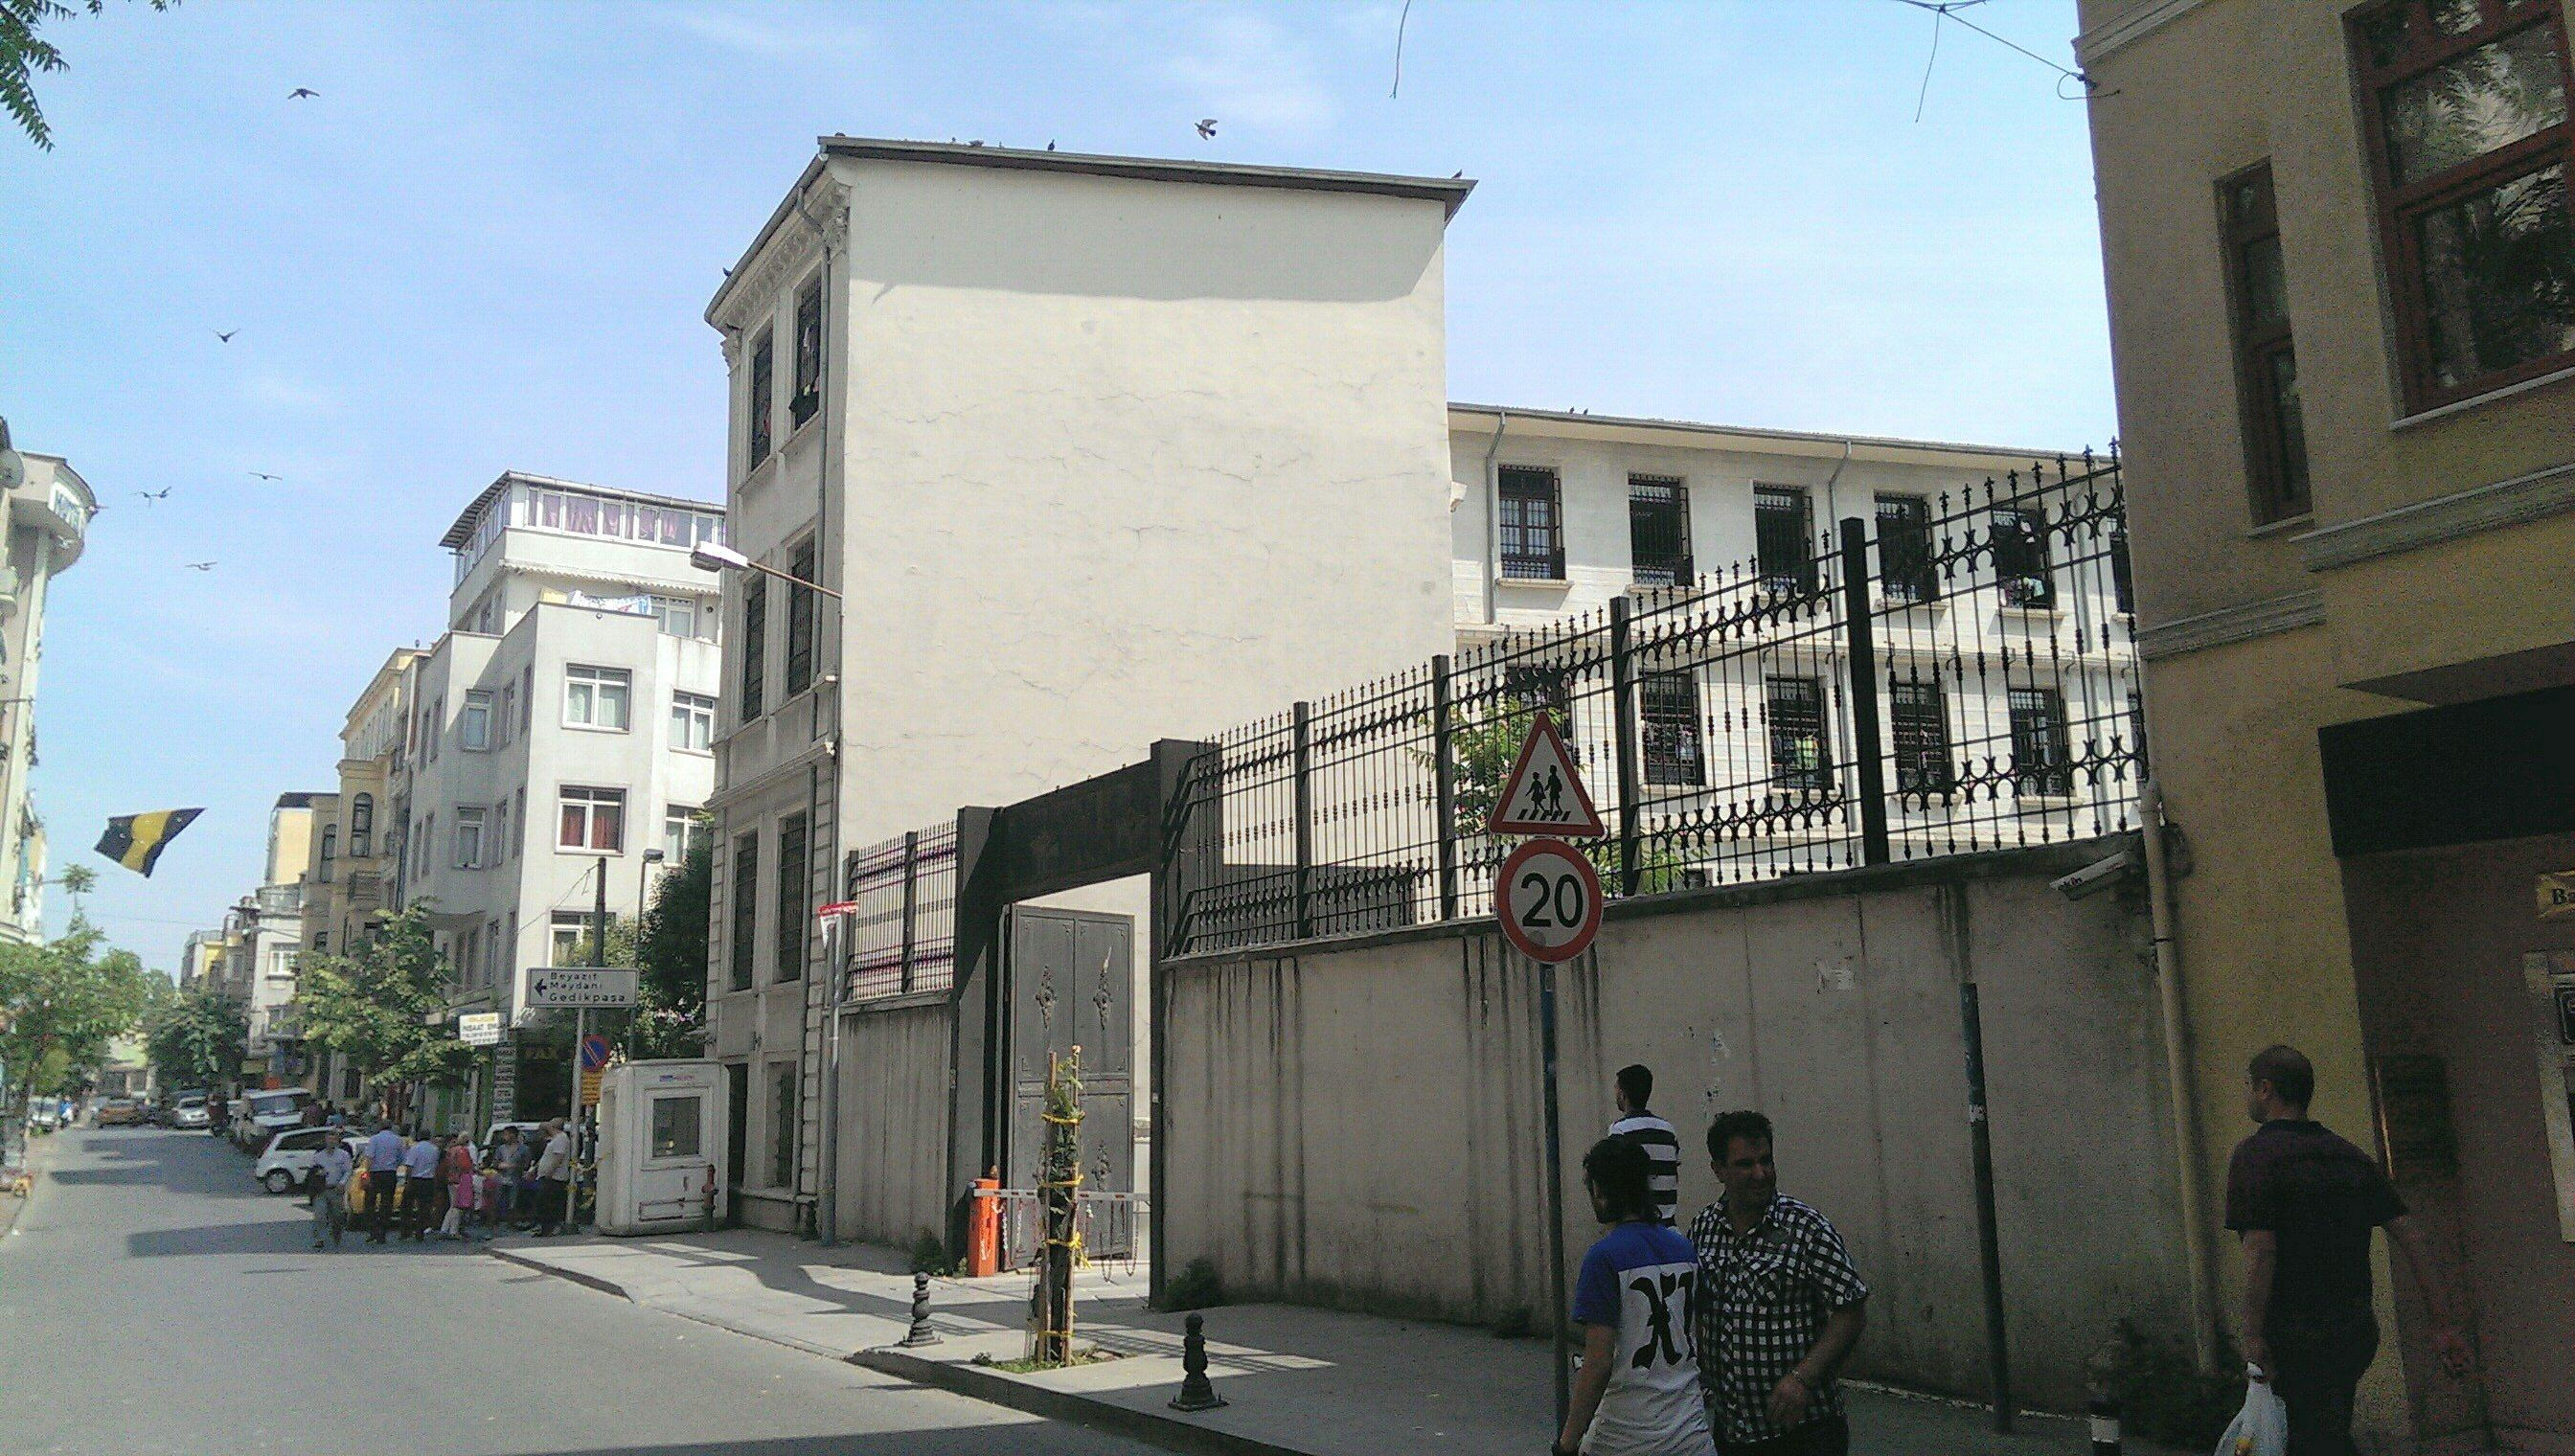 Kumpaki removal centre (Photo credit: CriticAtac, http://www.criticatac.ro/lefteast/wp-content/uploads/Detention-Center-Kumkap%C4%B1.jpg)